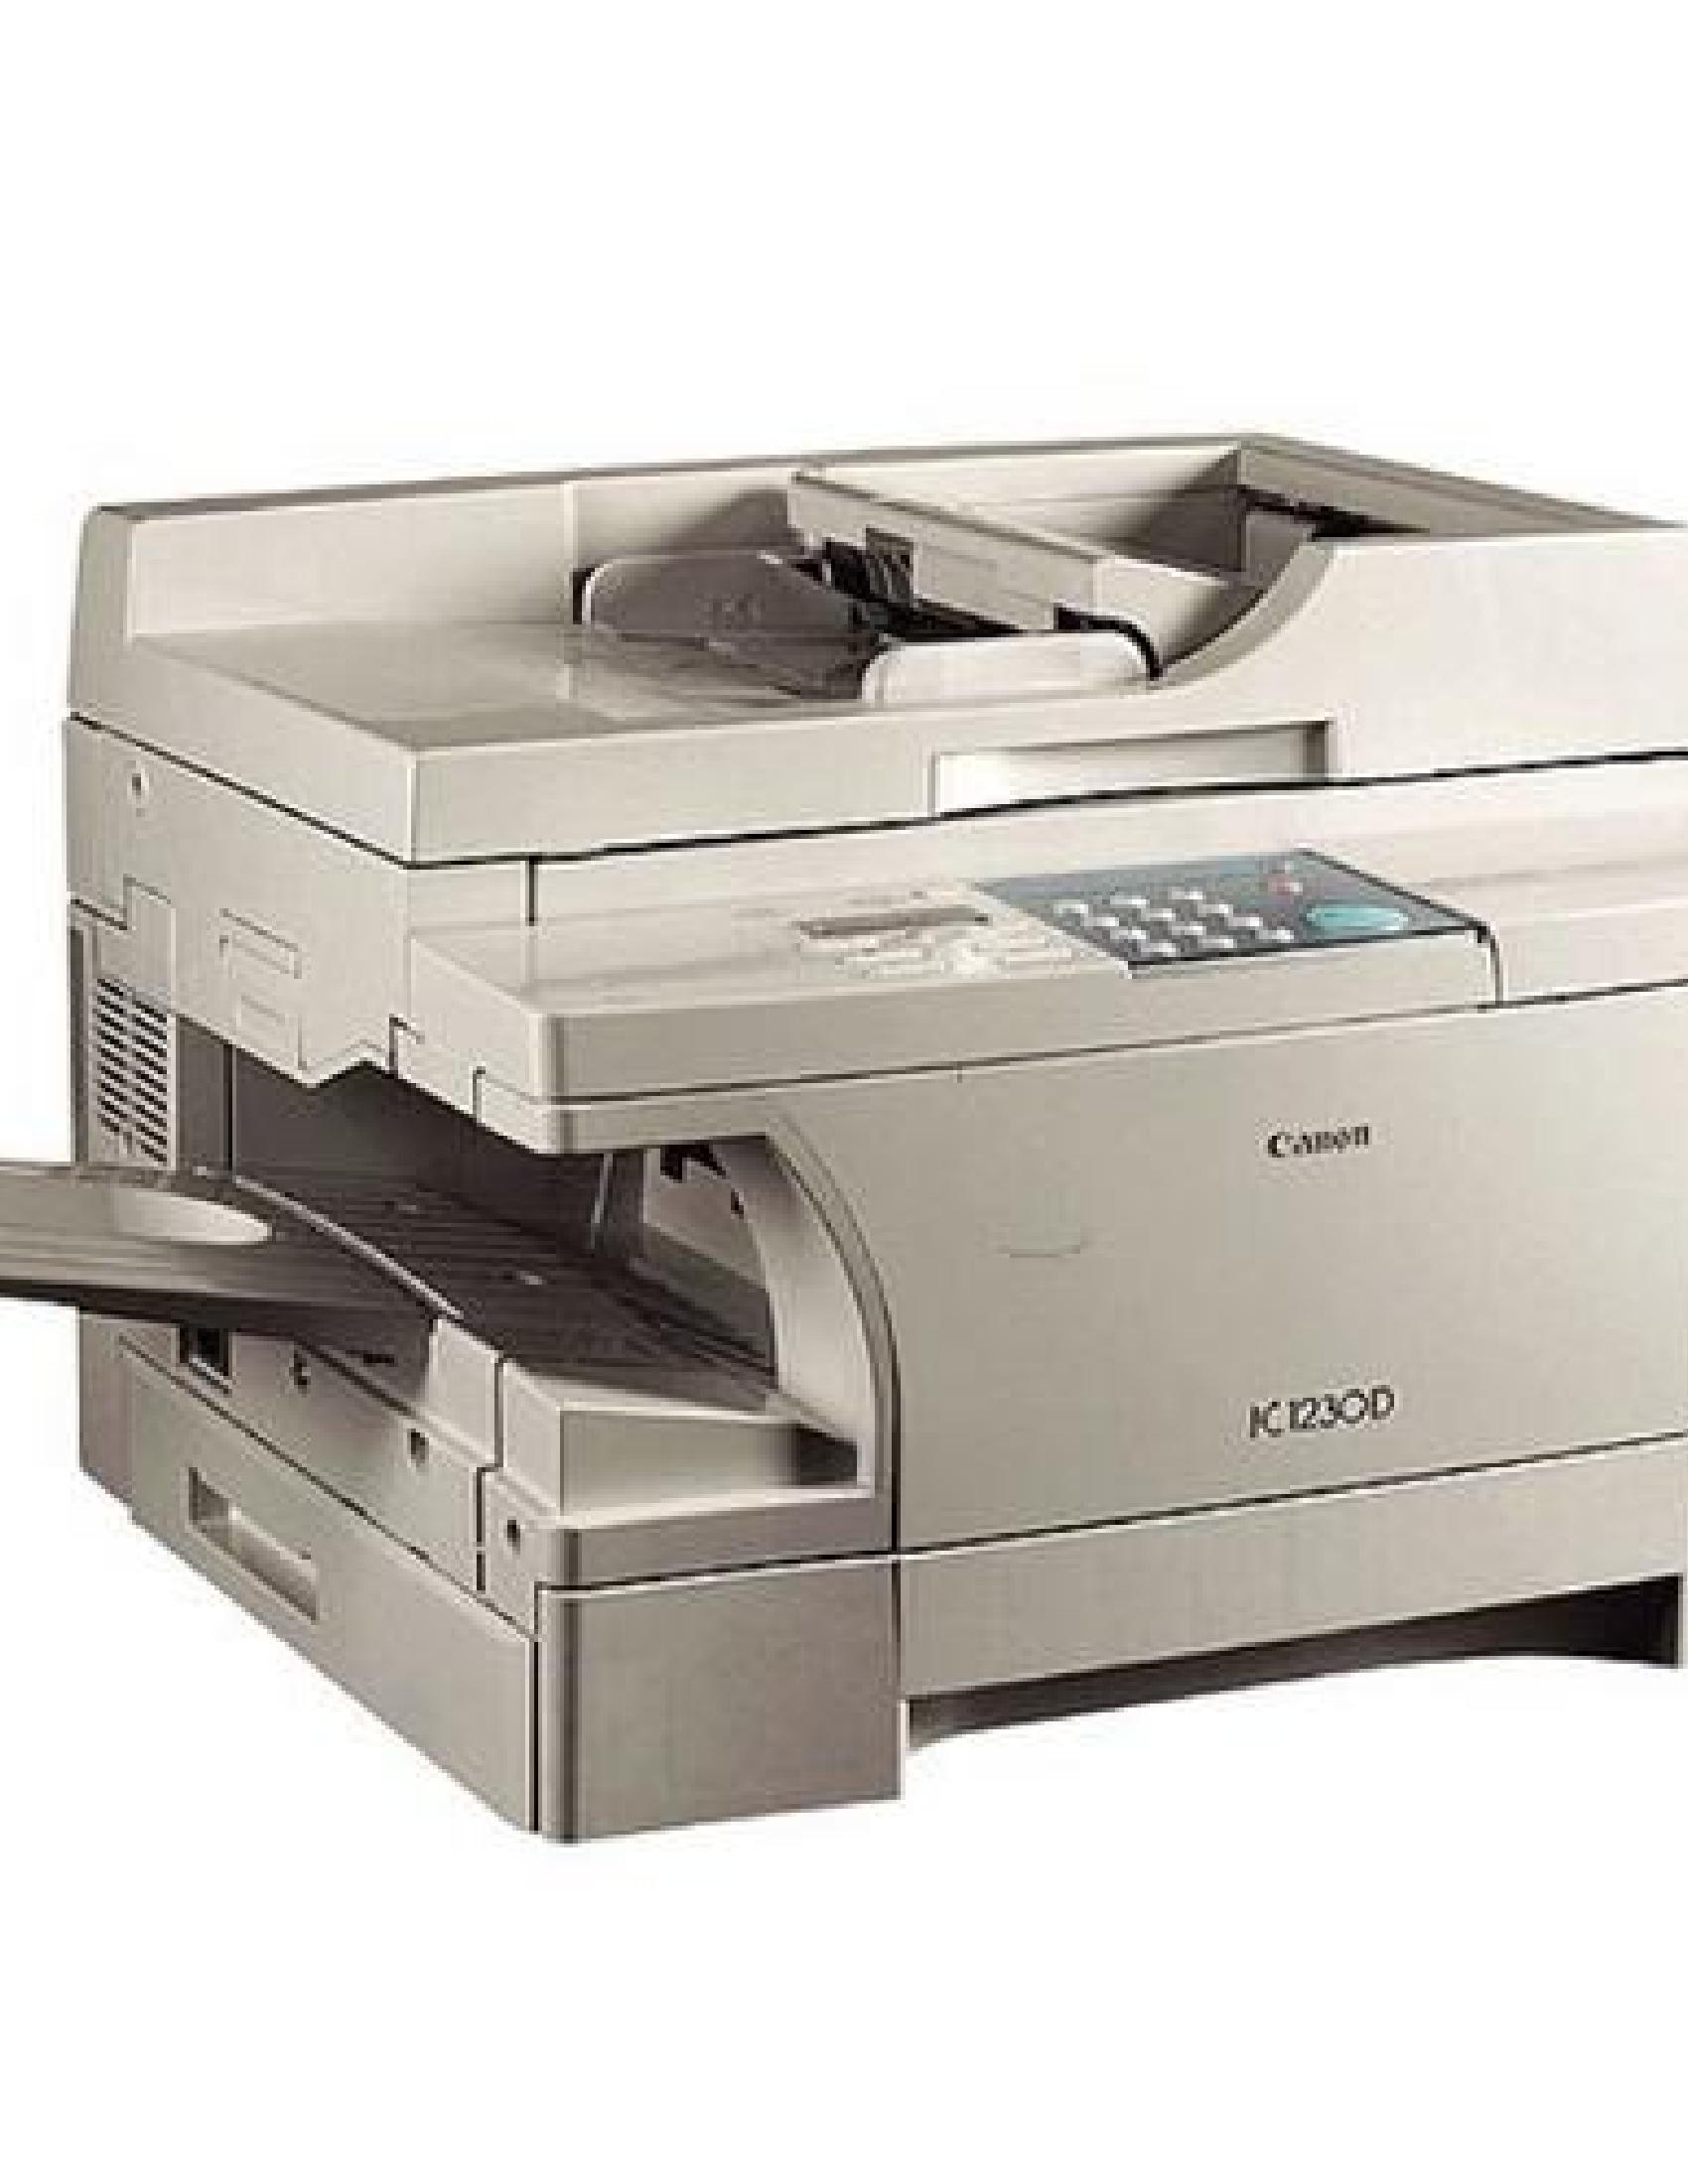 Canon PC1200s SmartBase Printer manual